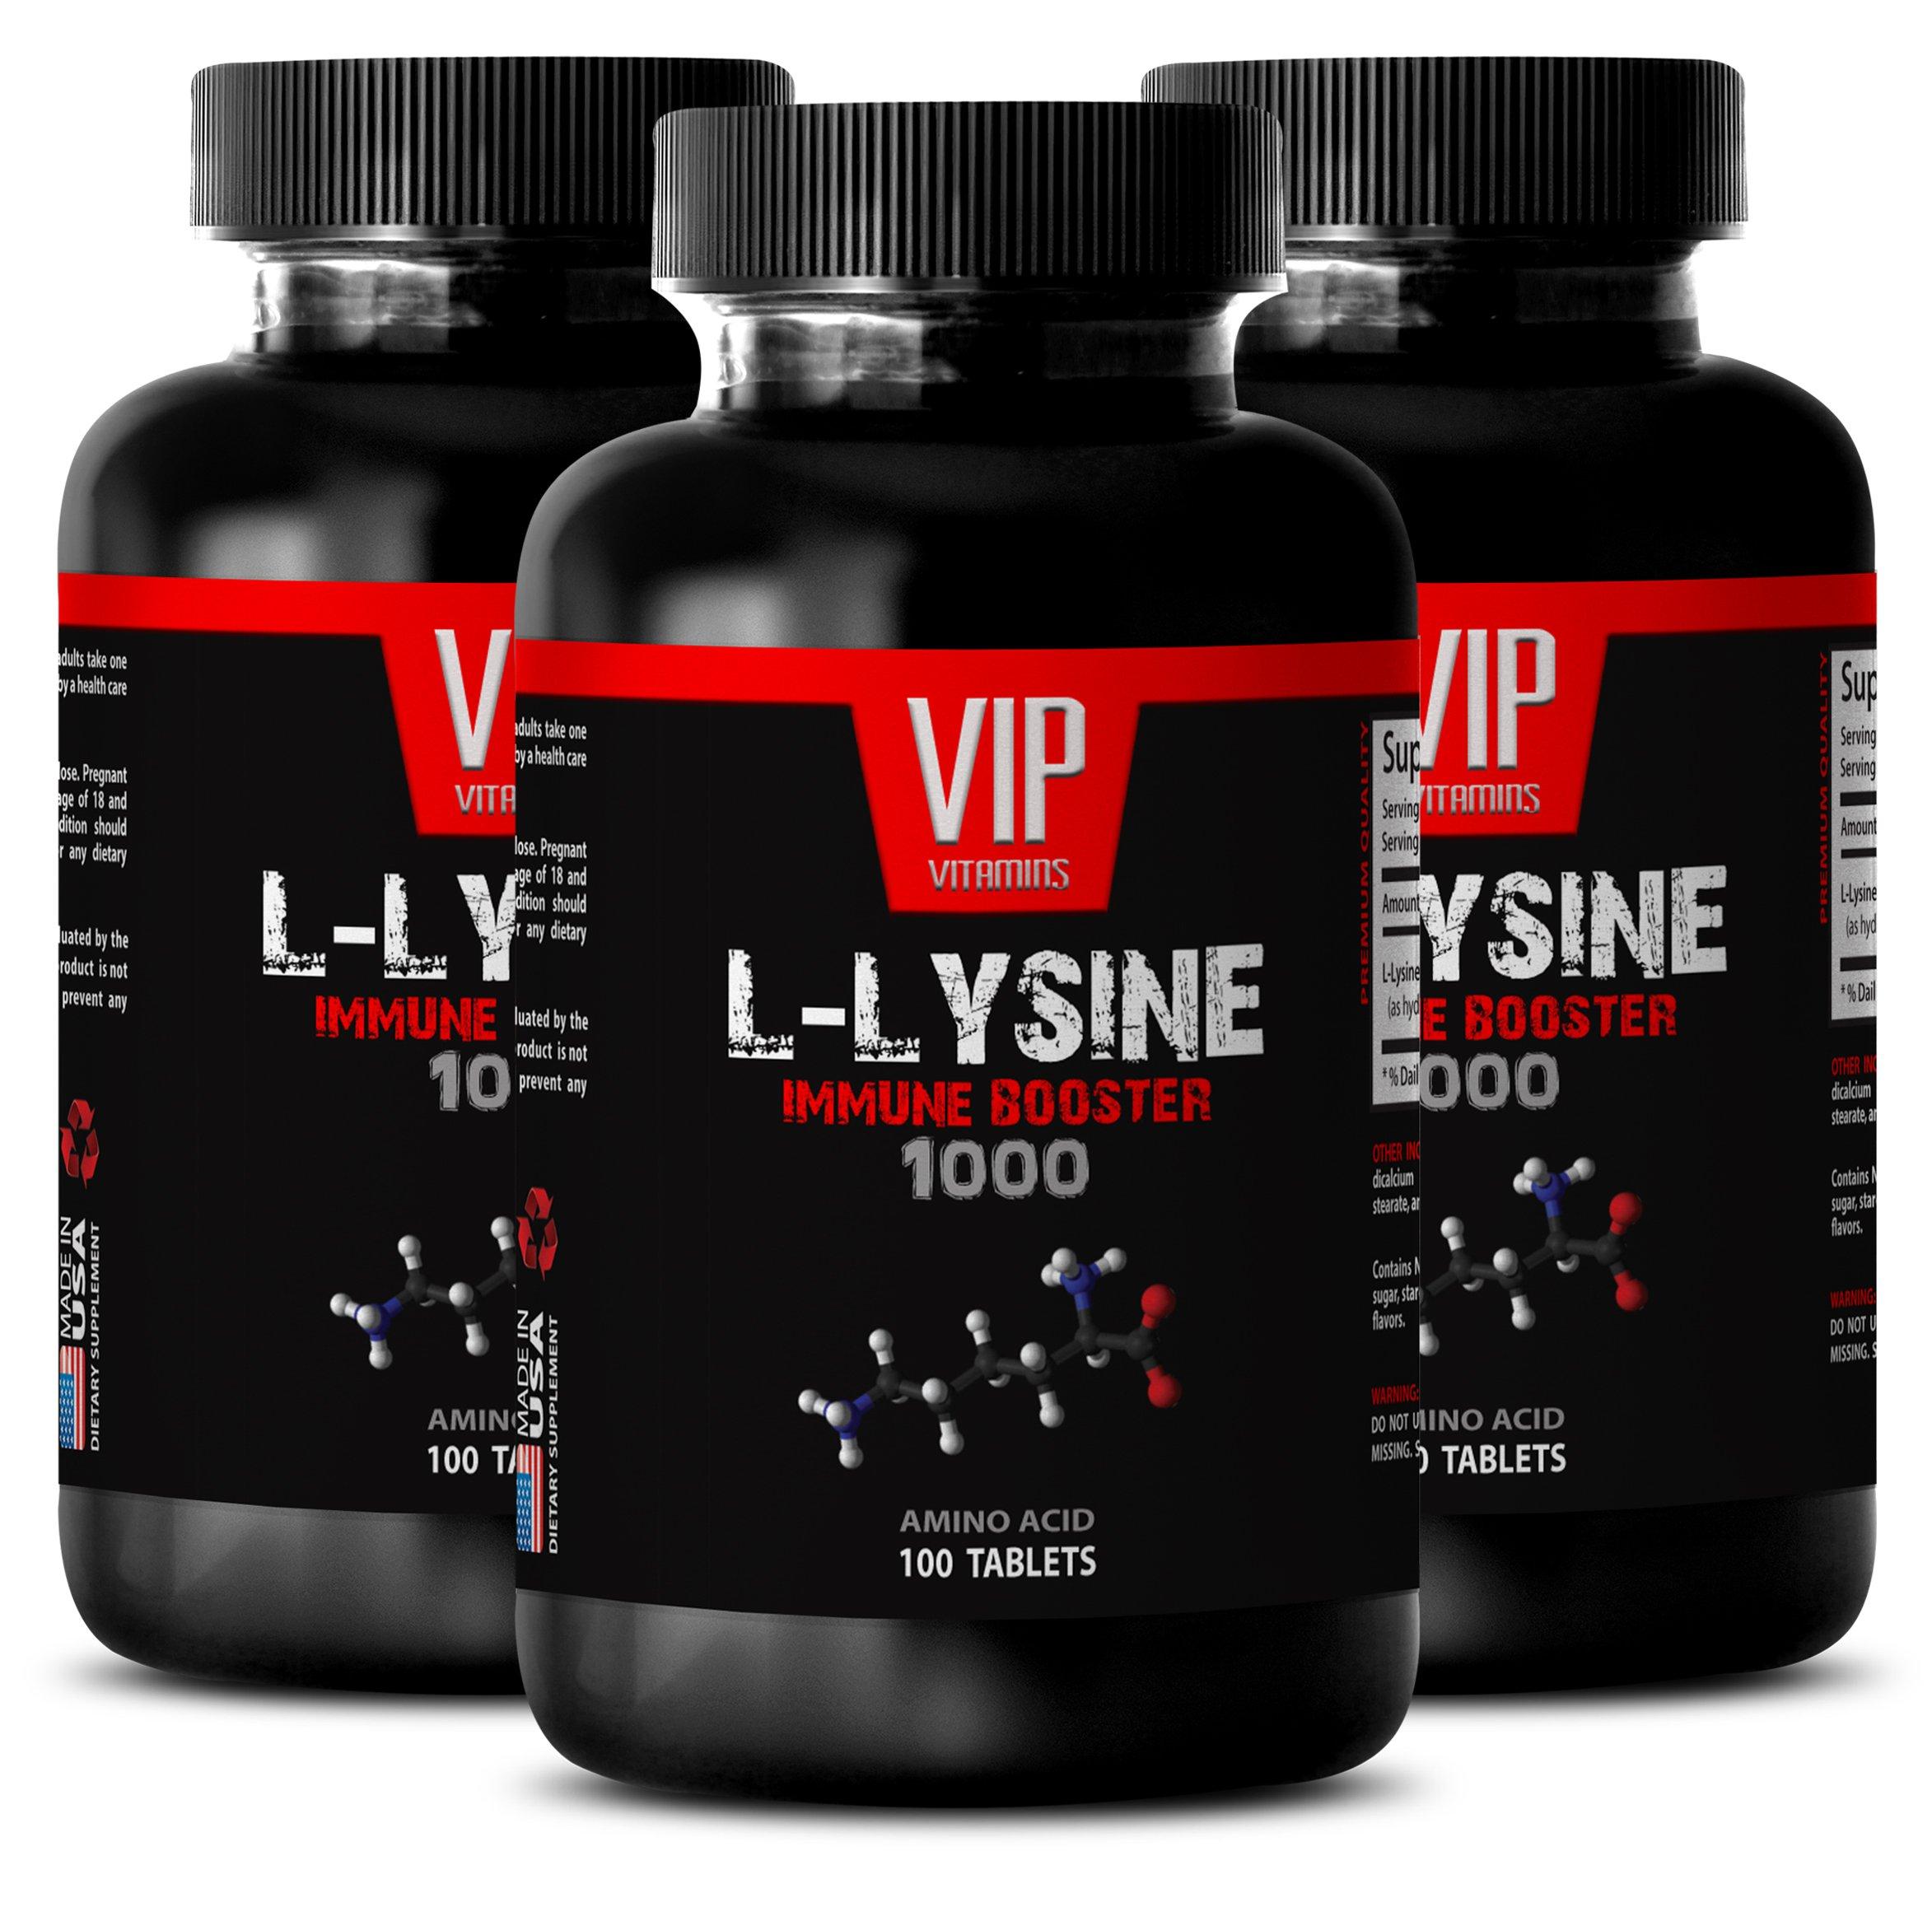 Immune system boost - L-LYSINE IMMUNE BOOSTER 1000 - Strengthen muscles - 3 Bottles 300 tablets